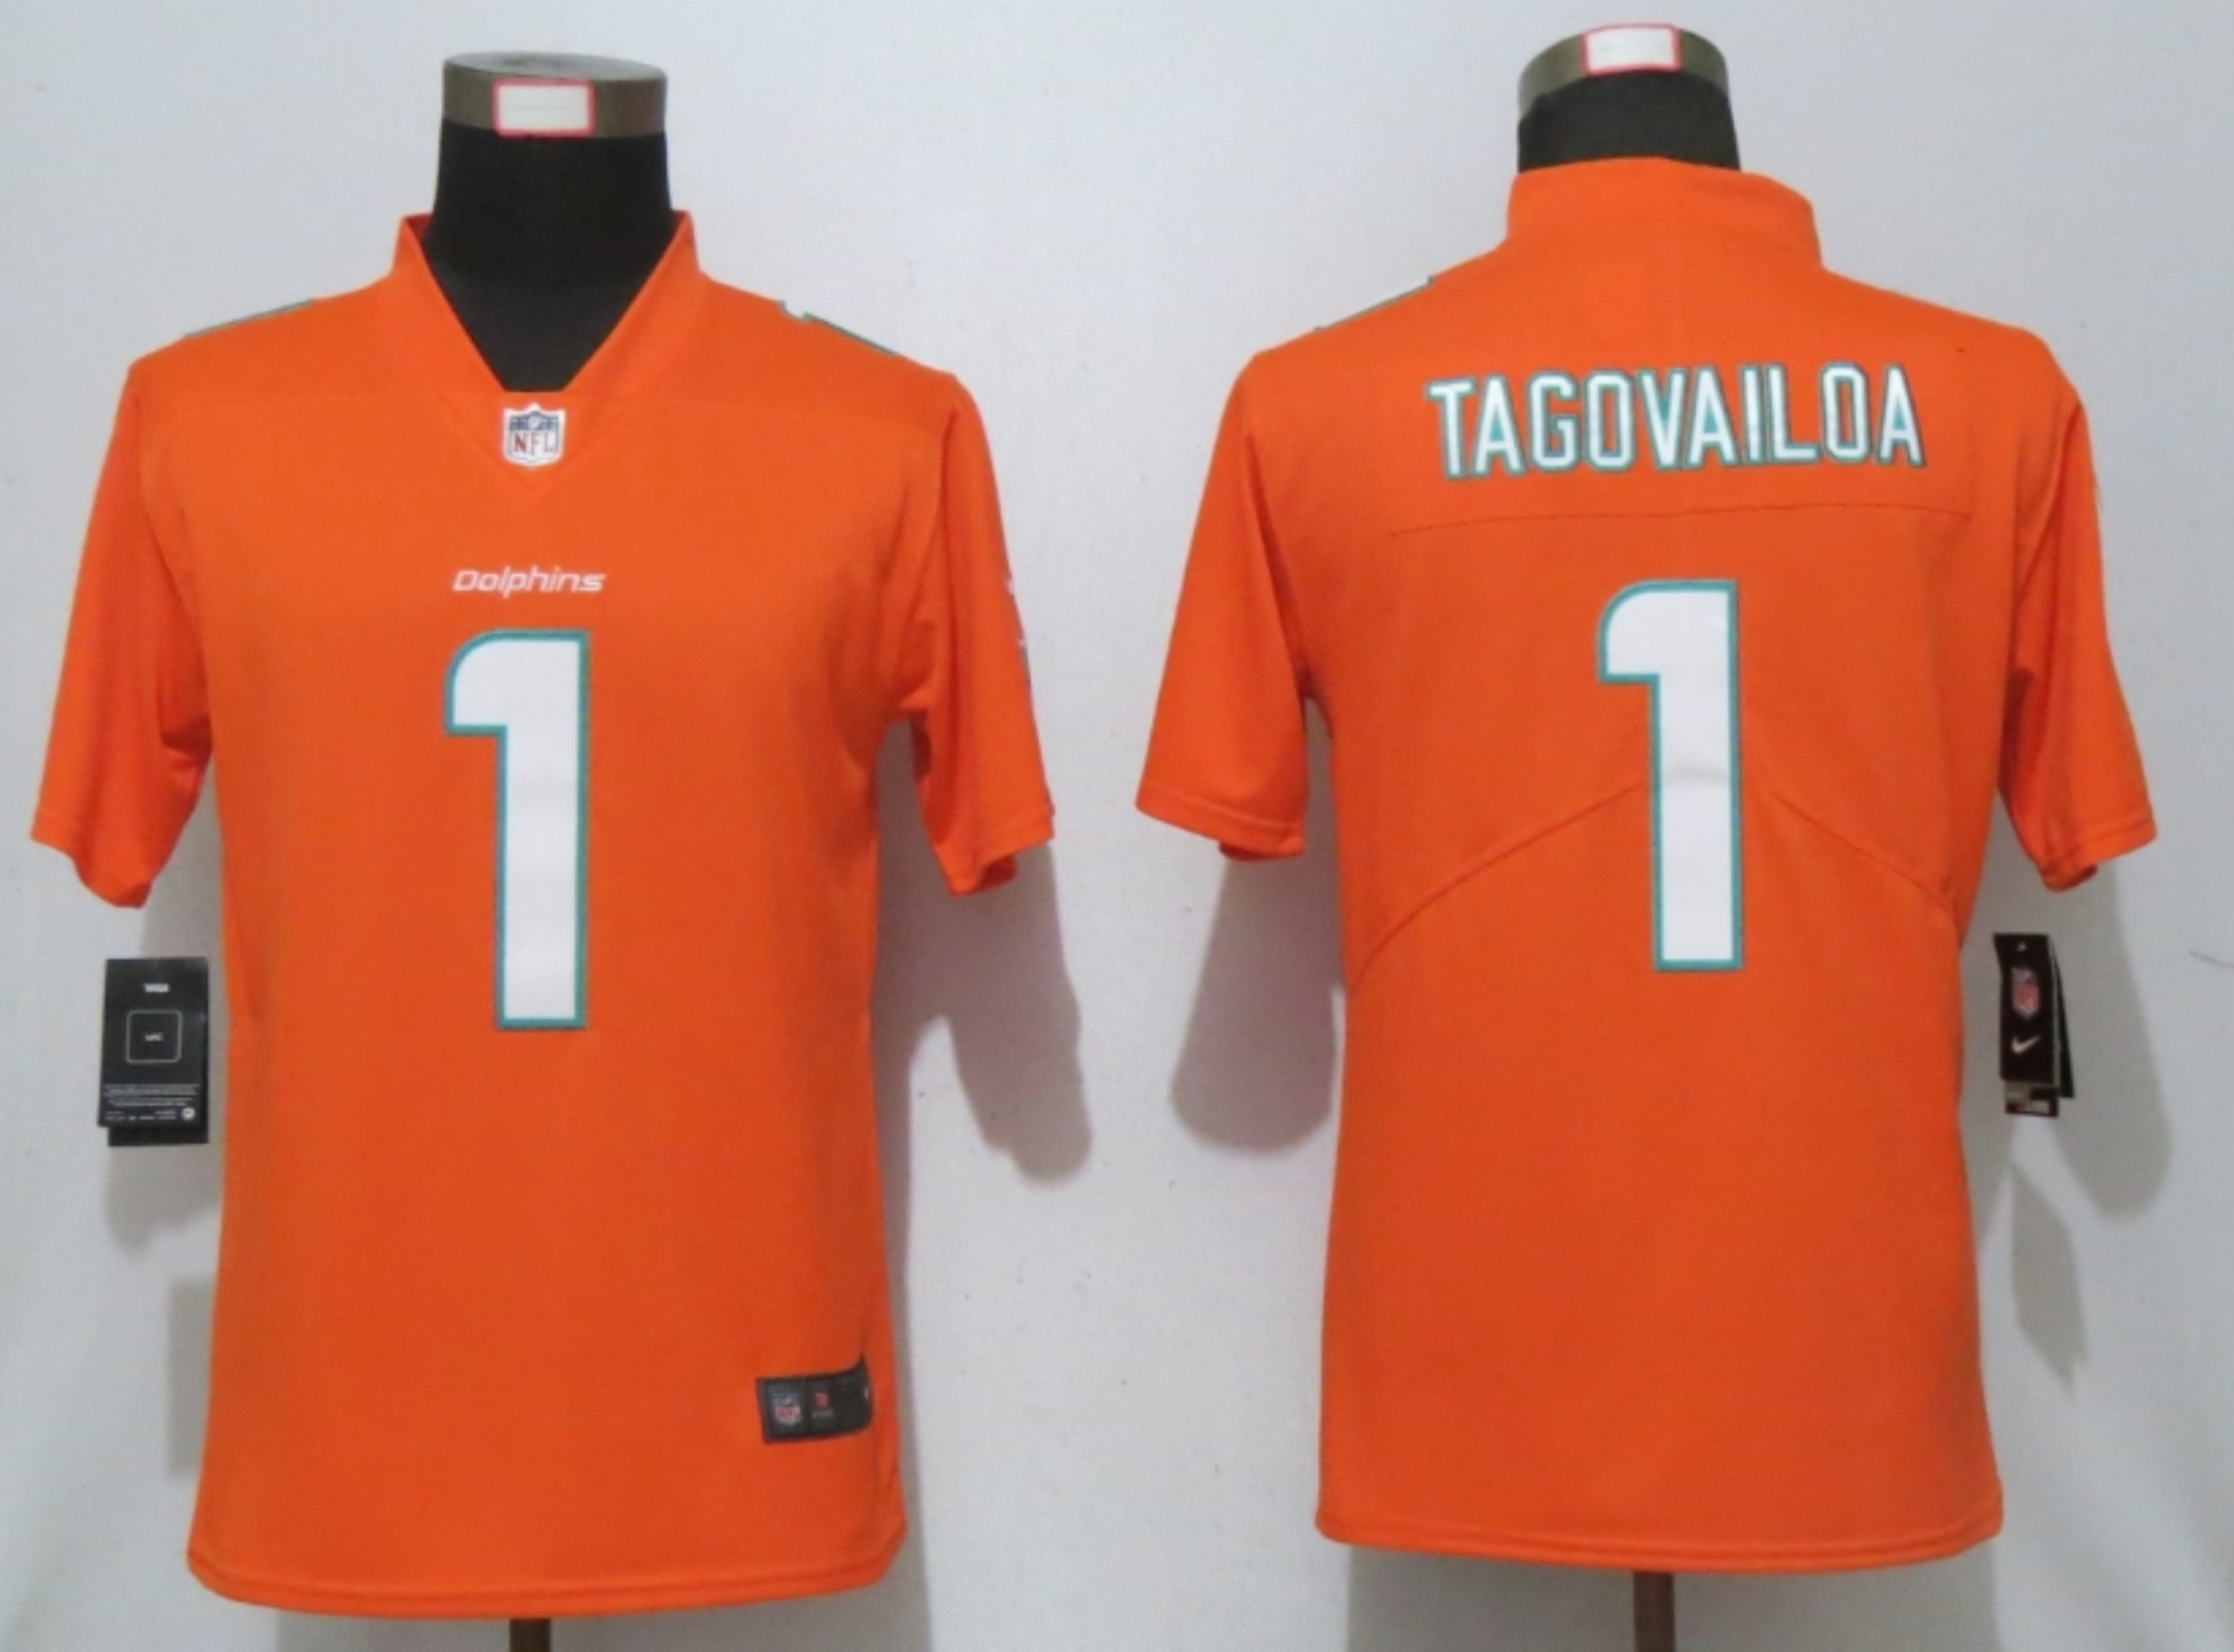 Women's Miami Dolphins #1 Tua Tagovailoa Orange 2020 Vapor Untouchable Stitched NFL Nike Limited Jersey